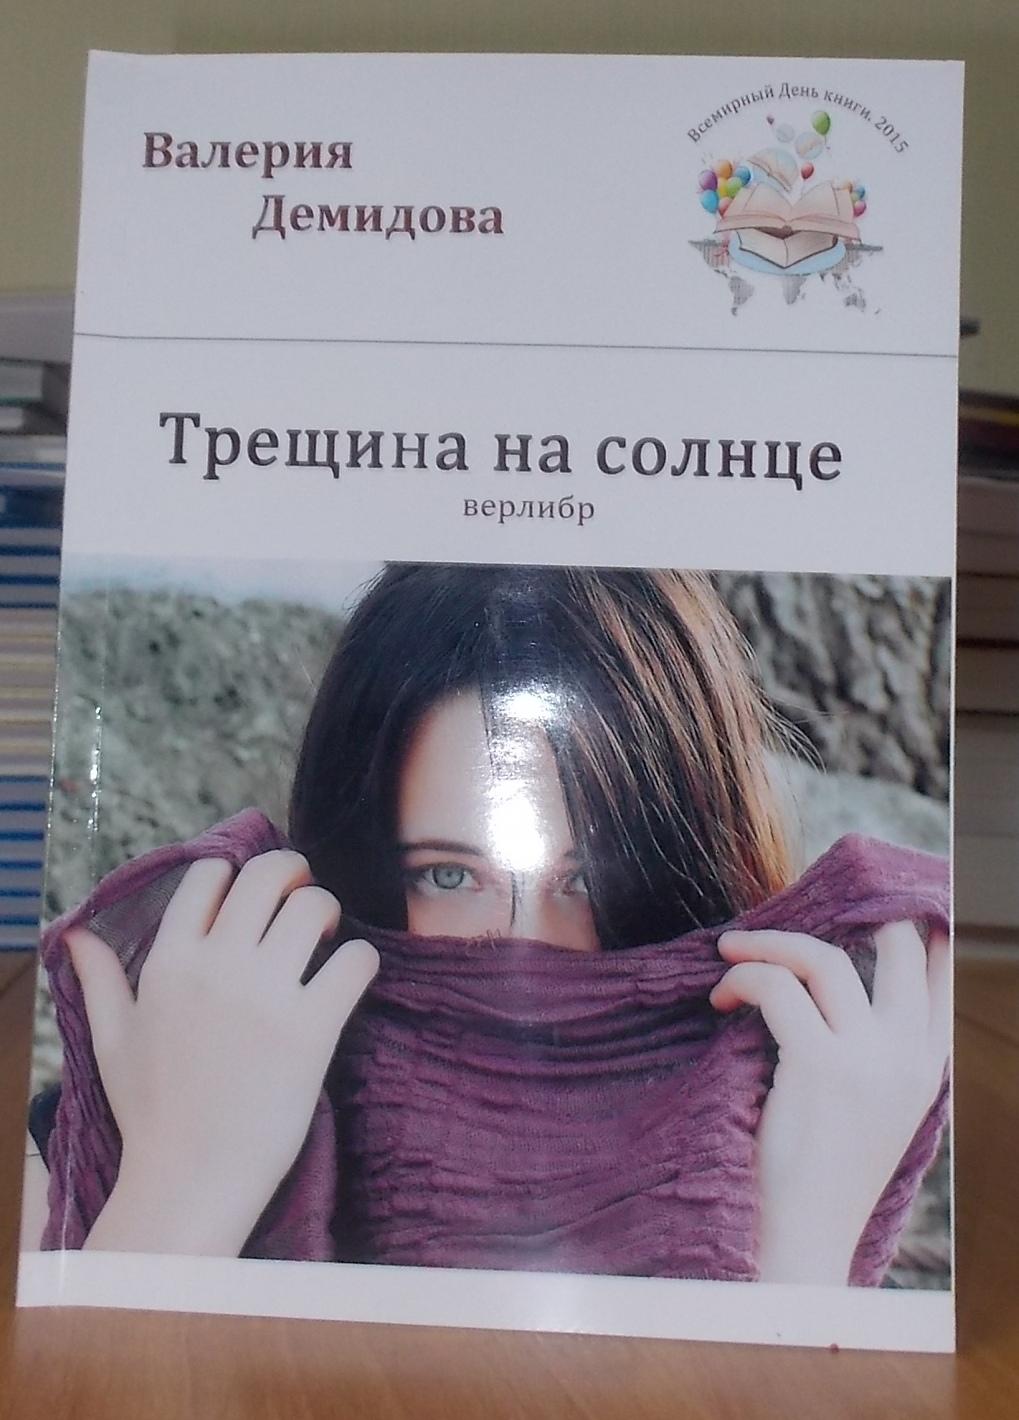 http://soyuz-pisatelei.ru/news/2015-05-22-1098